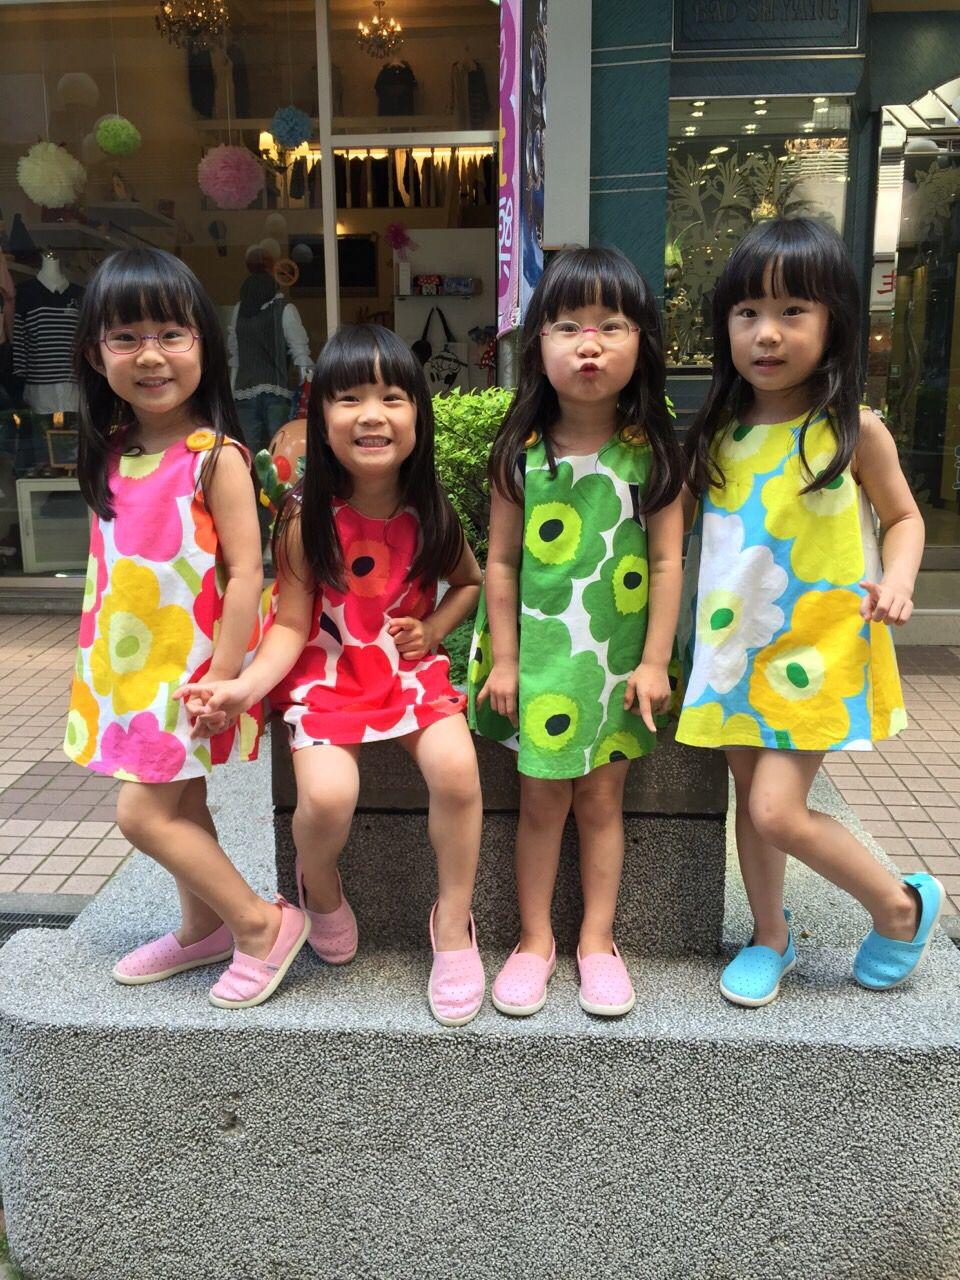 Wang Identical Quadruplets Audrey Emma Natalie And Isabelle